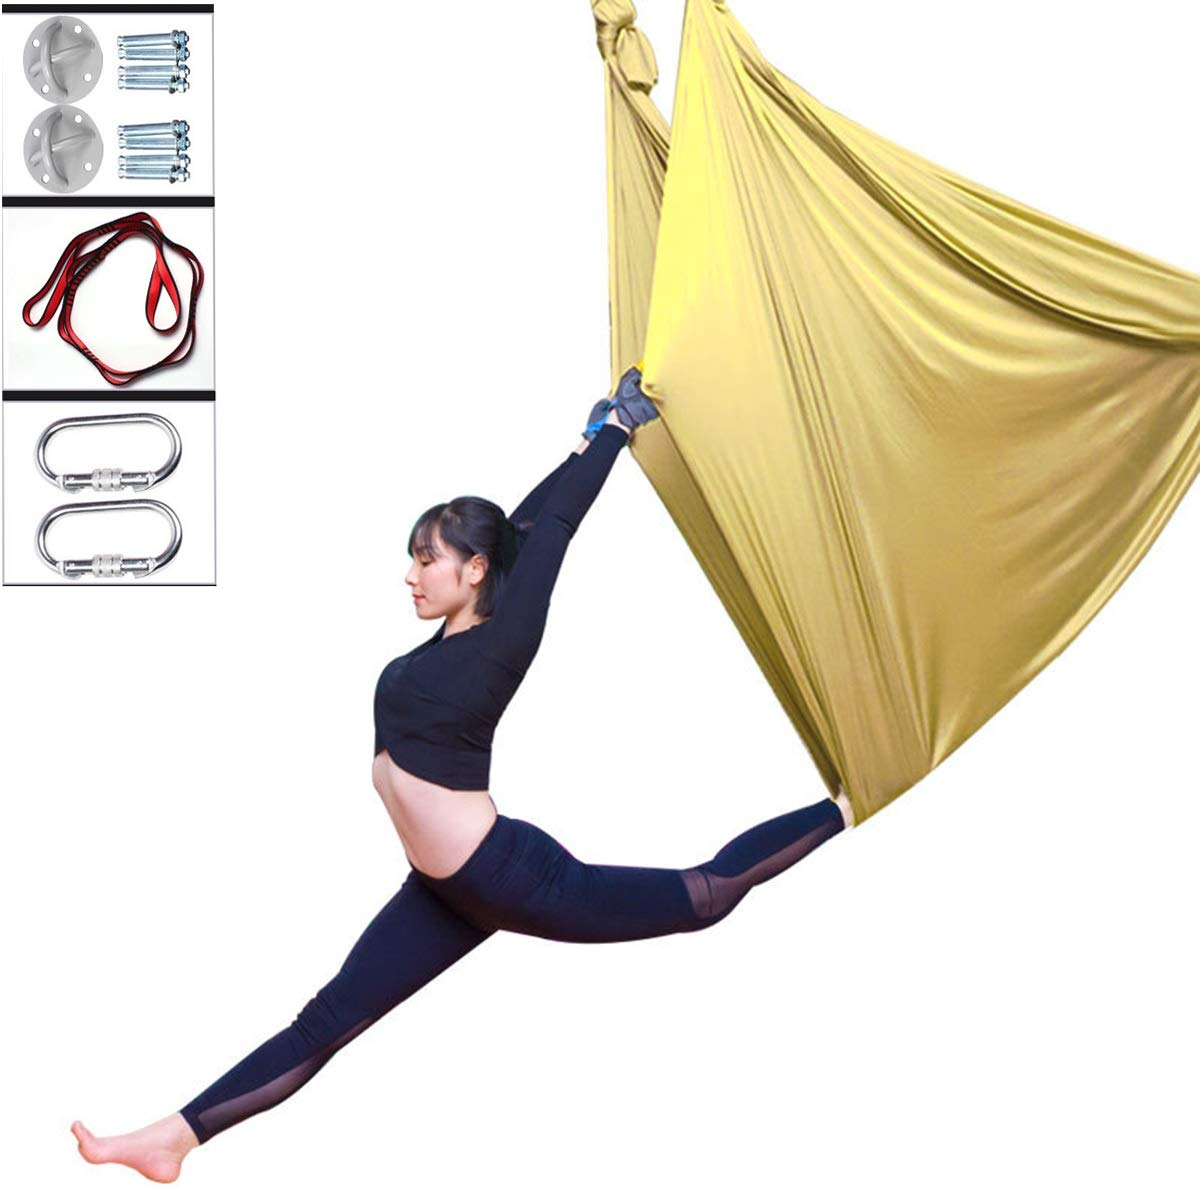 DSAEFG Juego de hamacas para Yoga aérea, Columpio elástico ...